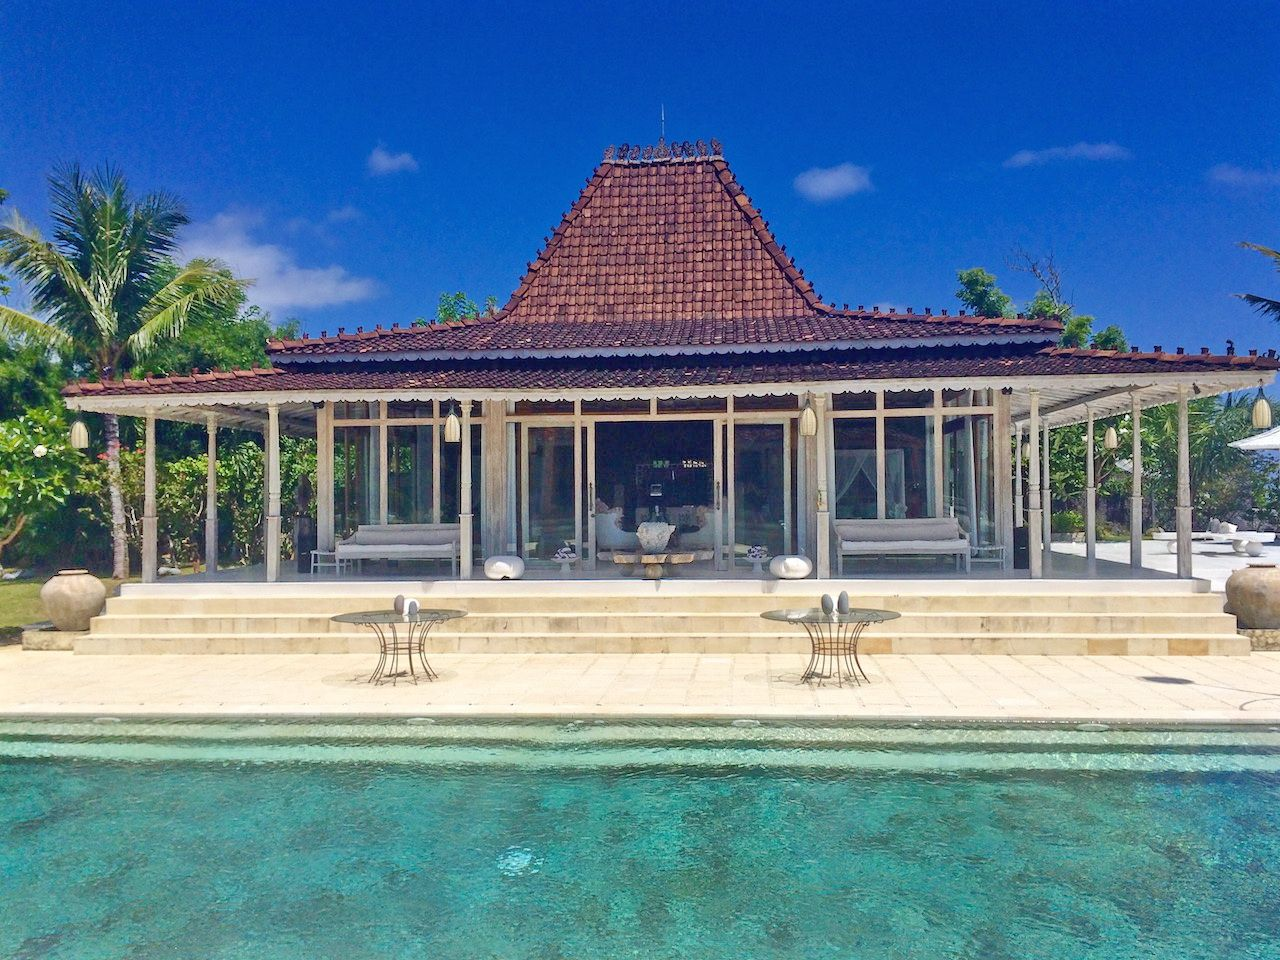 Villa Sunset At Plenilunio 4 6 11 Bedrooms Renting Option In Uluwatu Bali Wedding Venue Cliff Bali Uluwatu